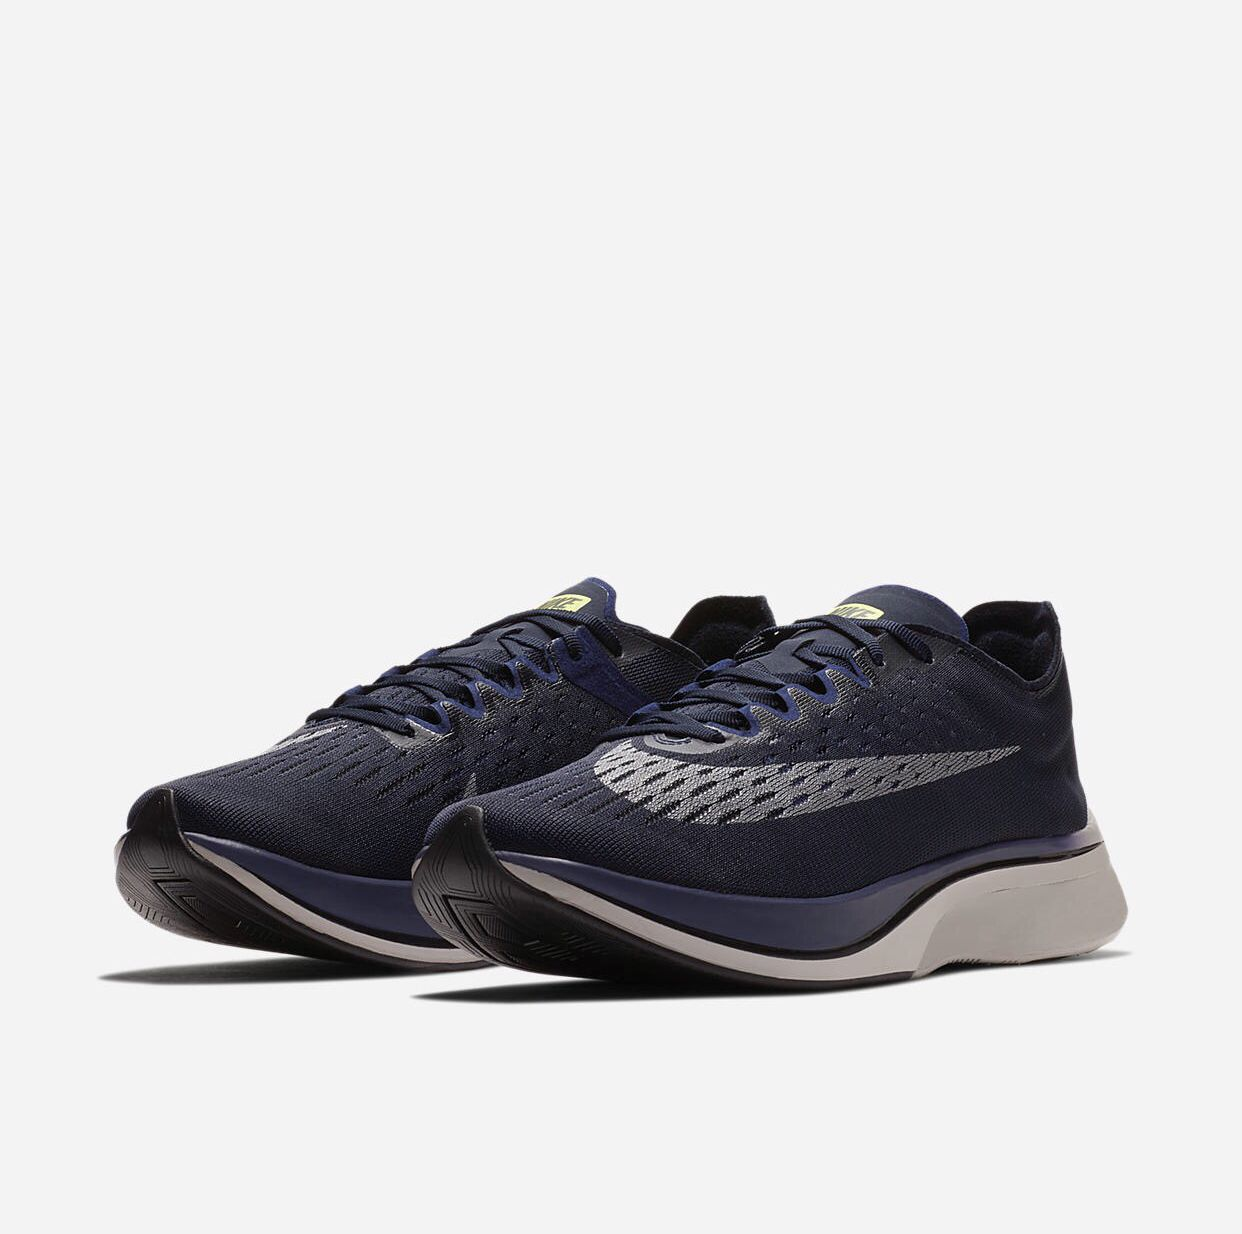 2bd5b76c24c3 Nike Zoom Vaporfly 4% Obsidian Neutral Indigo Metallic Silver releasing  4.11.18